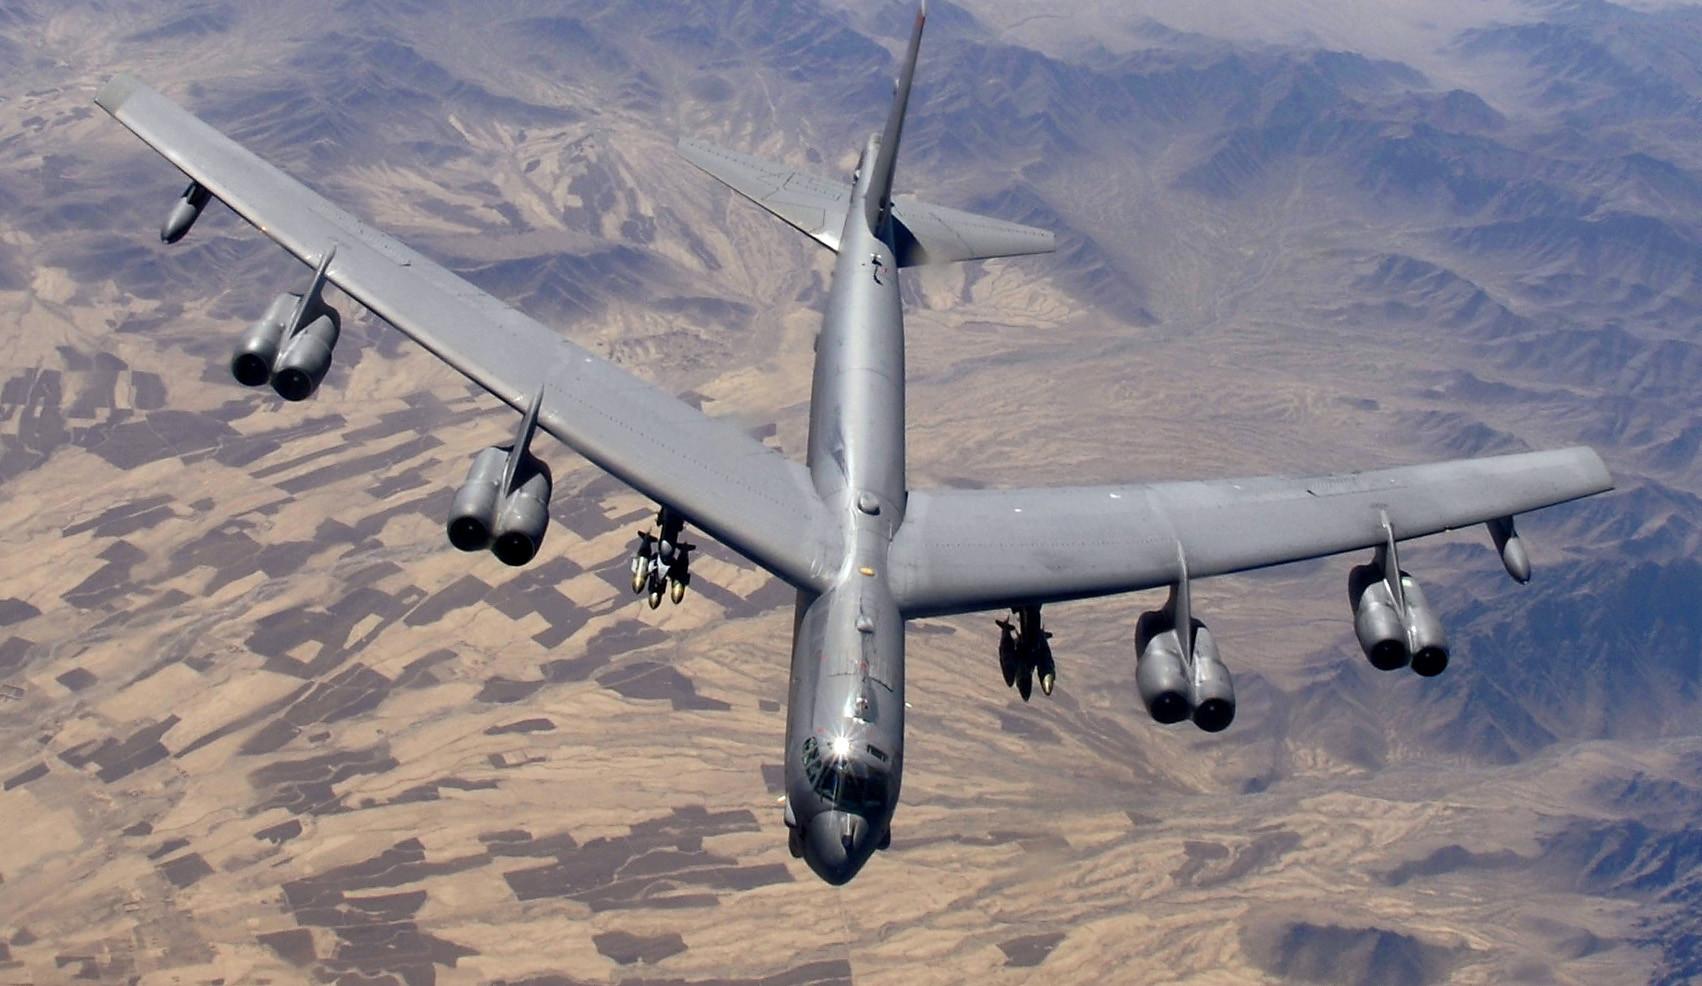 "<p>Фото © <a href=""https://ru.wikipedia.org/wiki/Boeing_B-52_Stratofortress#/media/Файл:B-52_over_Afghanistan.JPG"" target=""_self"">Wikipedia</a></p>"